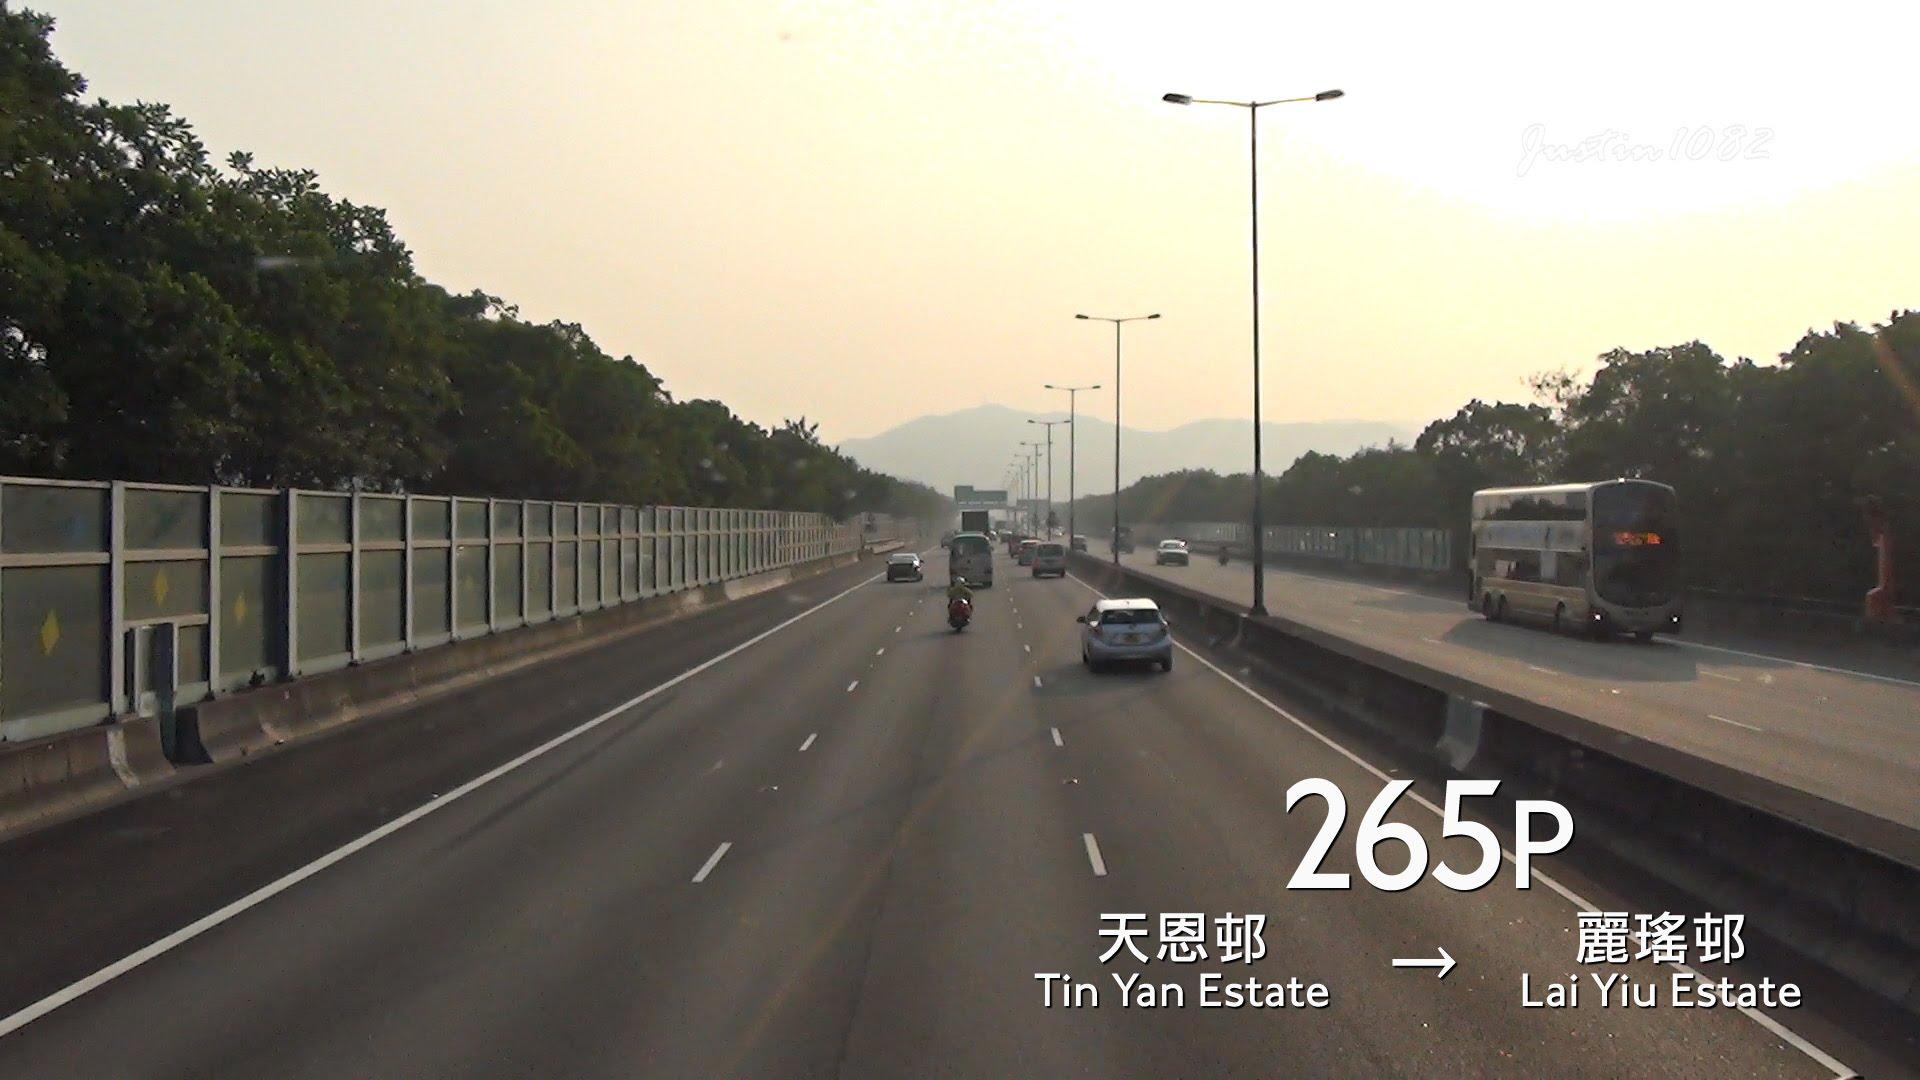 [Hong Kong Bus Ride] 九巴 AP162 @ 265P 往 麗瑤 [天恩-荃灣站]